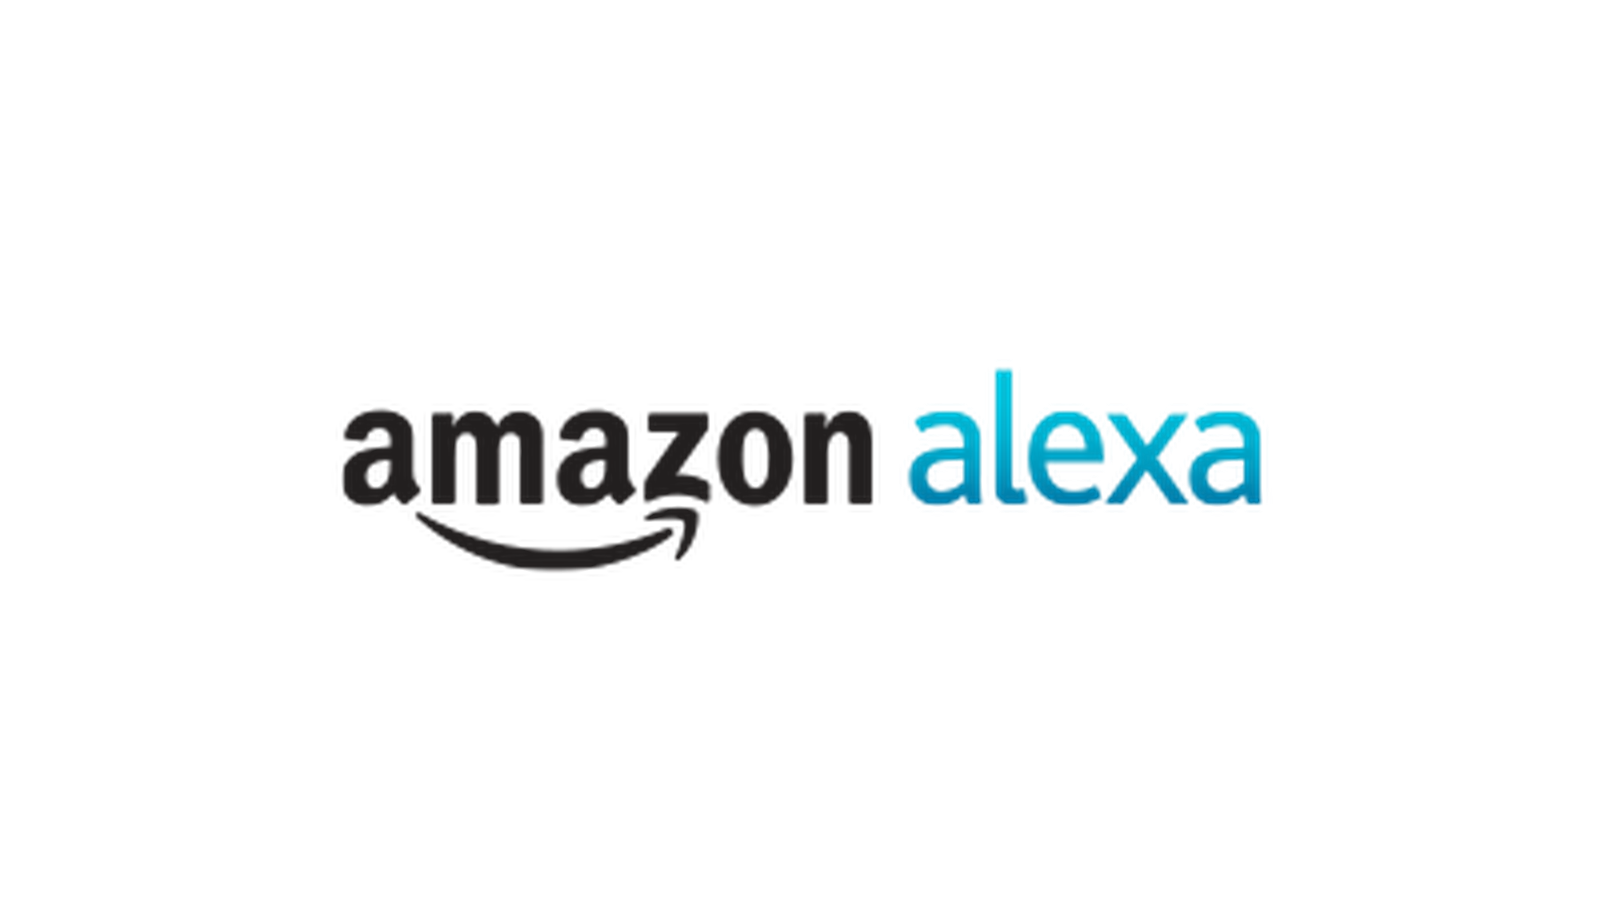 Alexa va incepe in curand sa-si aminteasca lucruri pentru a fi mai contextual